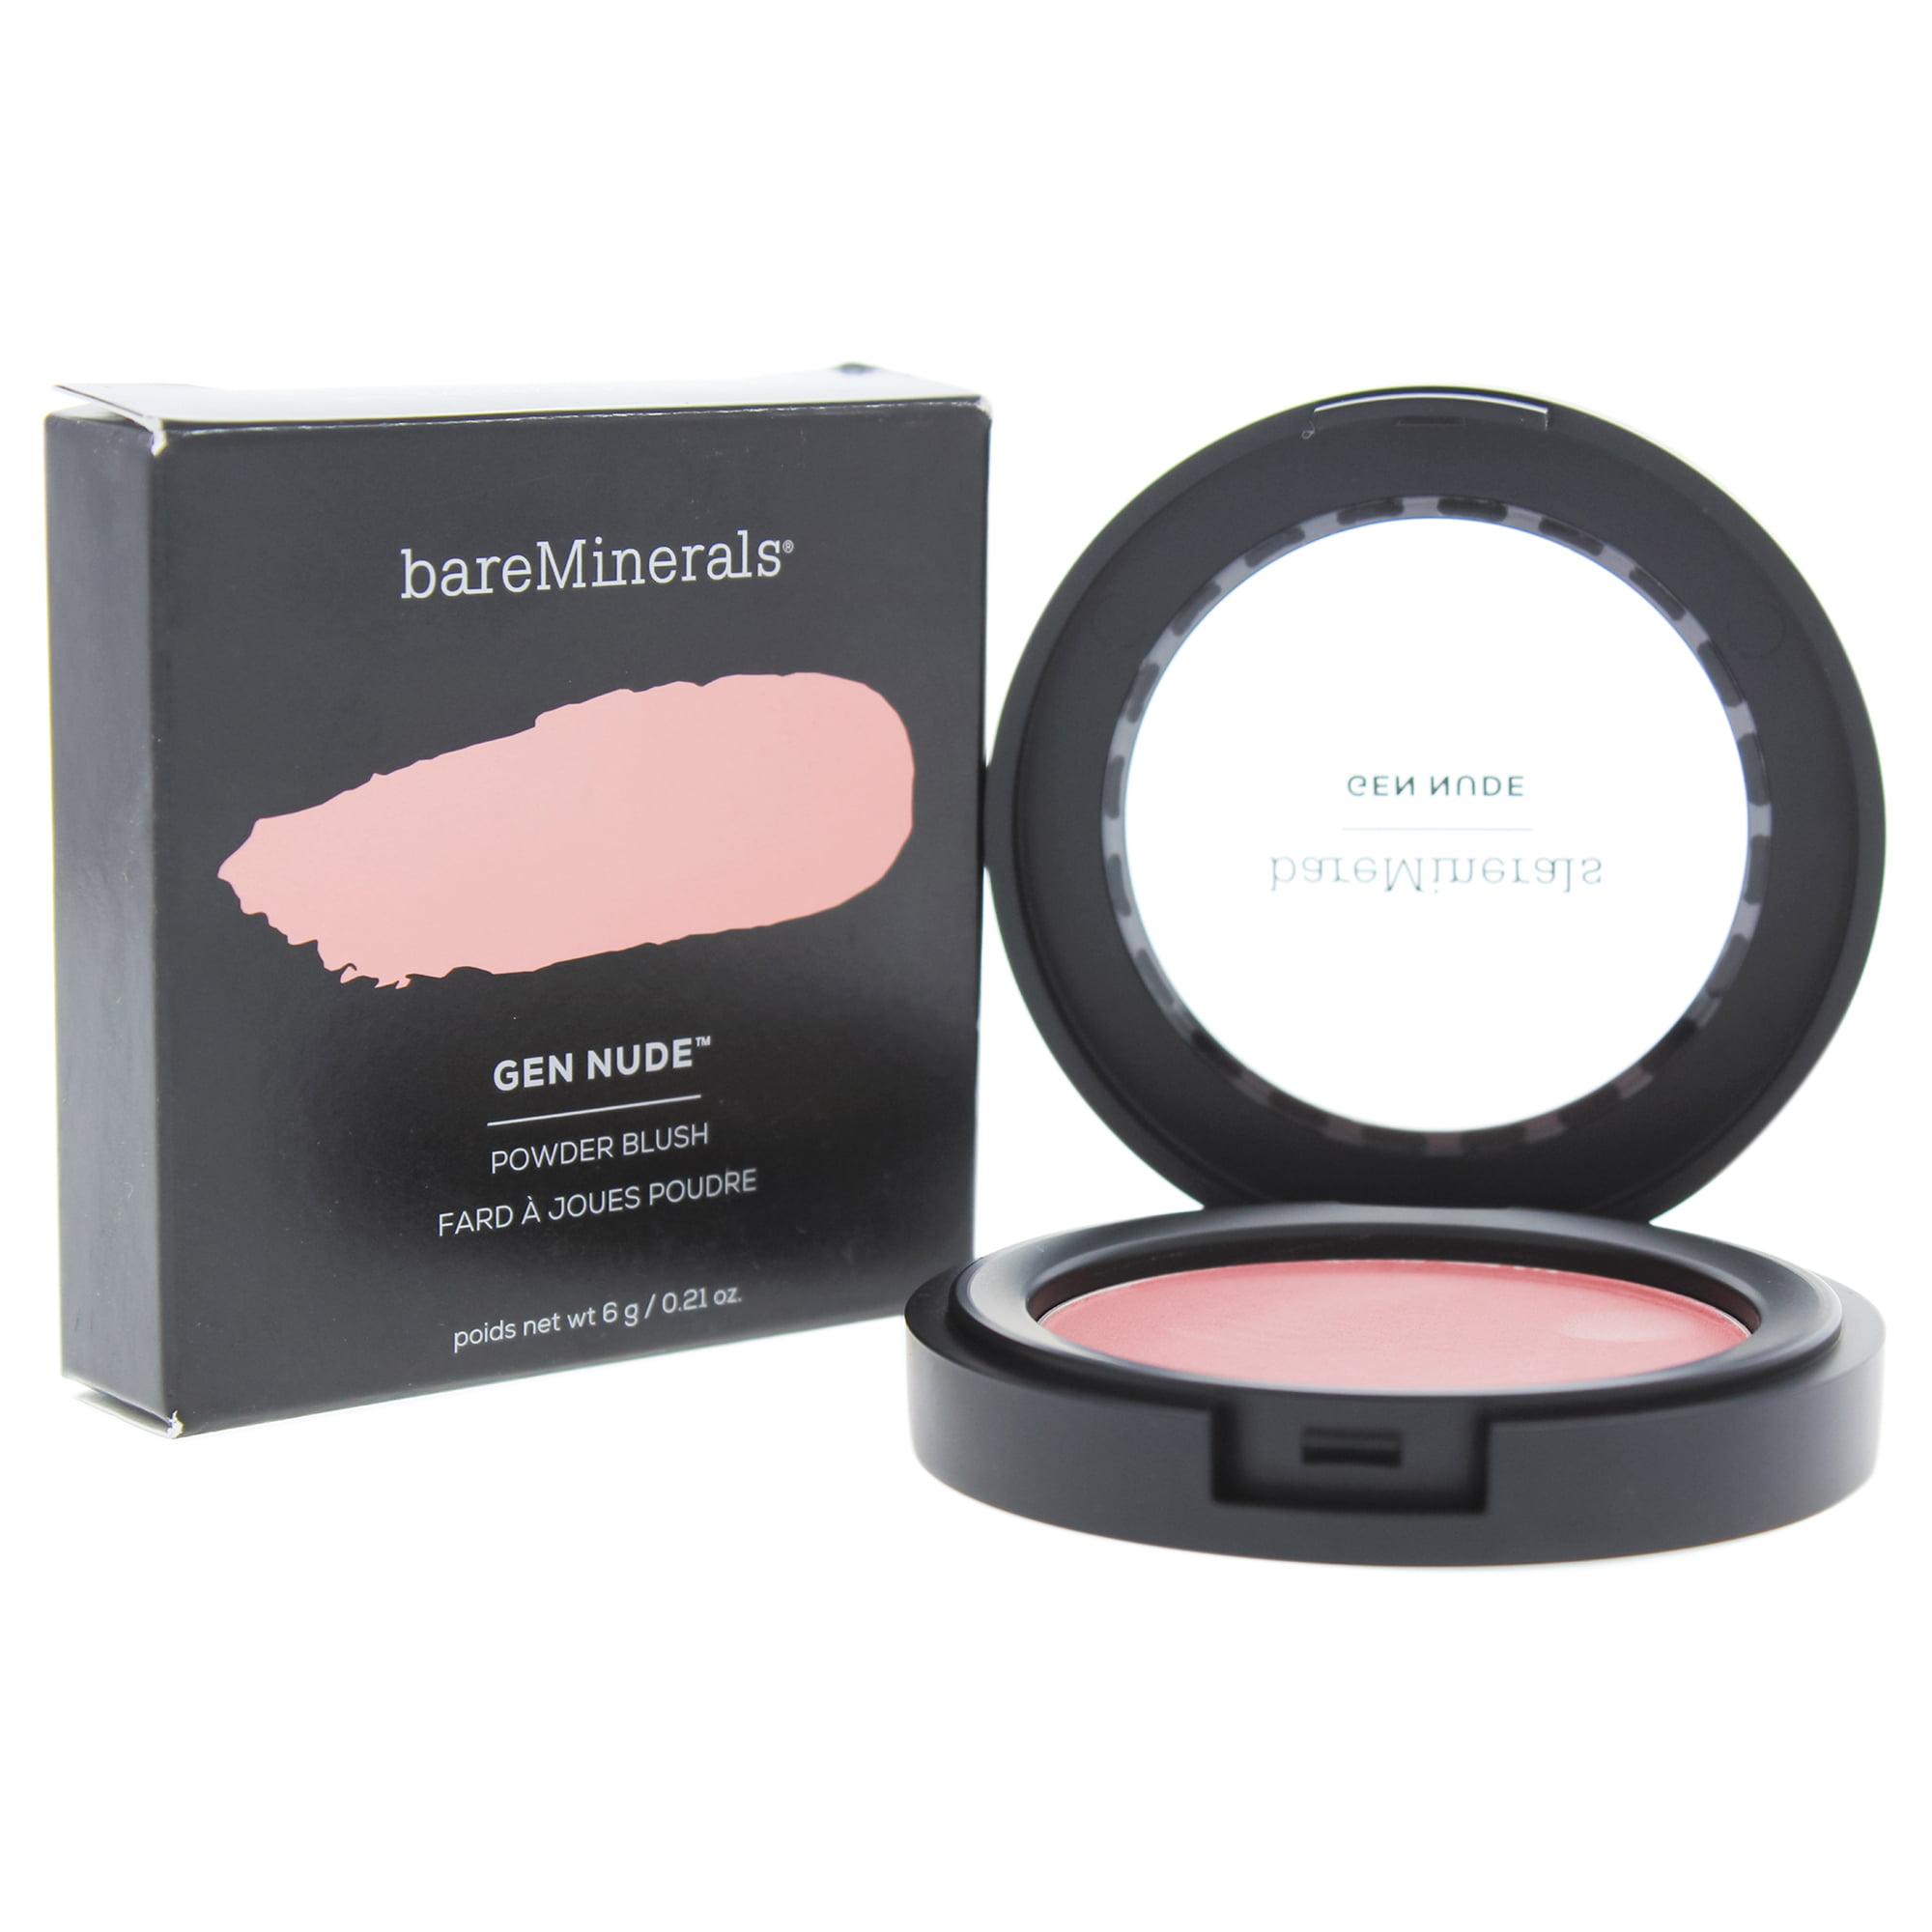 Gen Nude Powder Blush - Call My Blush by bareMinerals for Women - 0.21 Blush